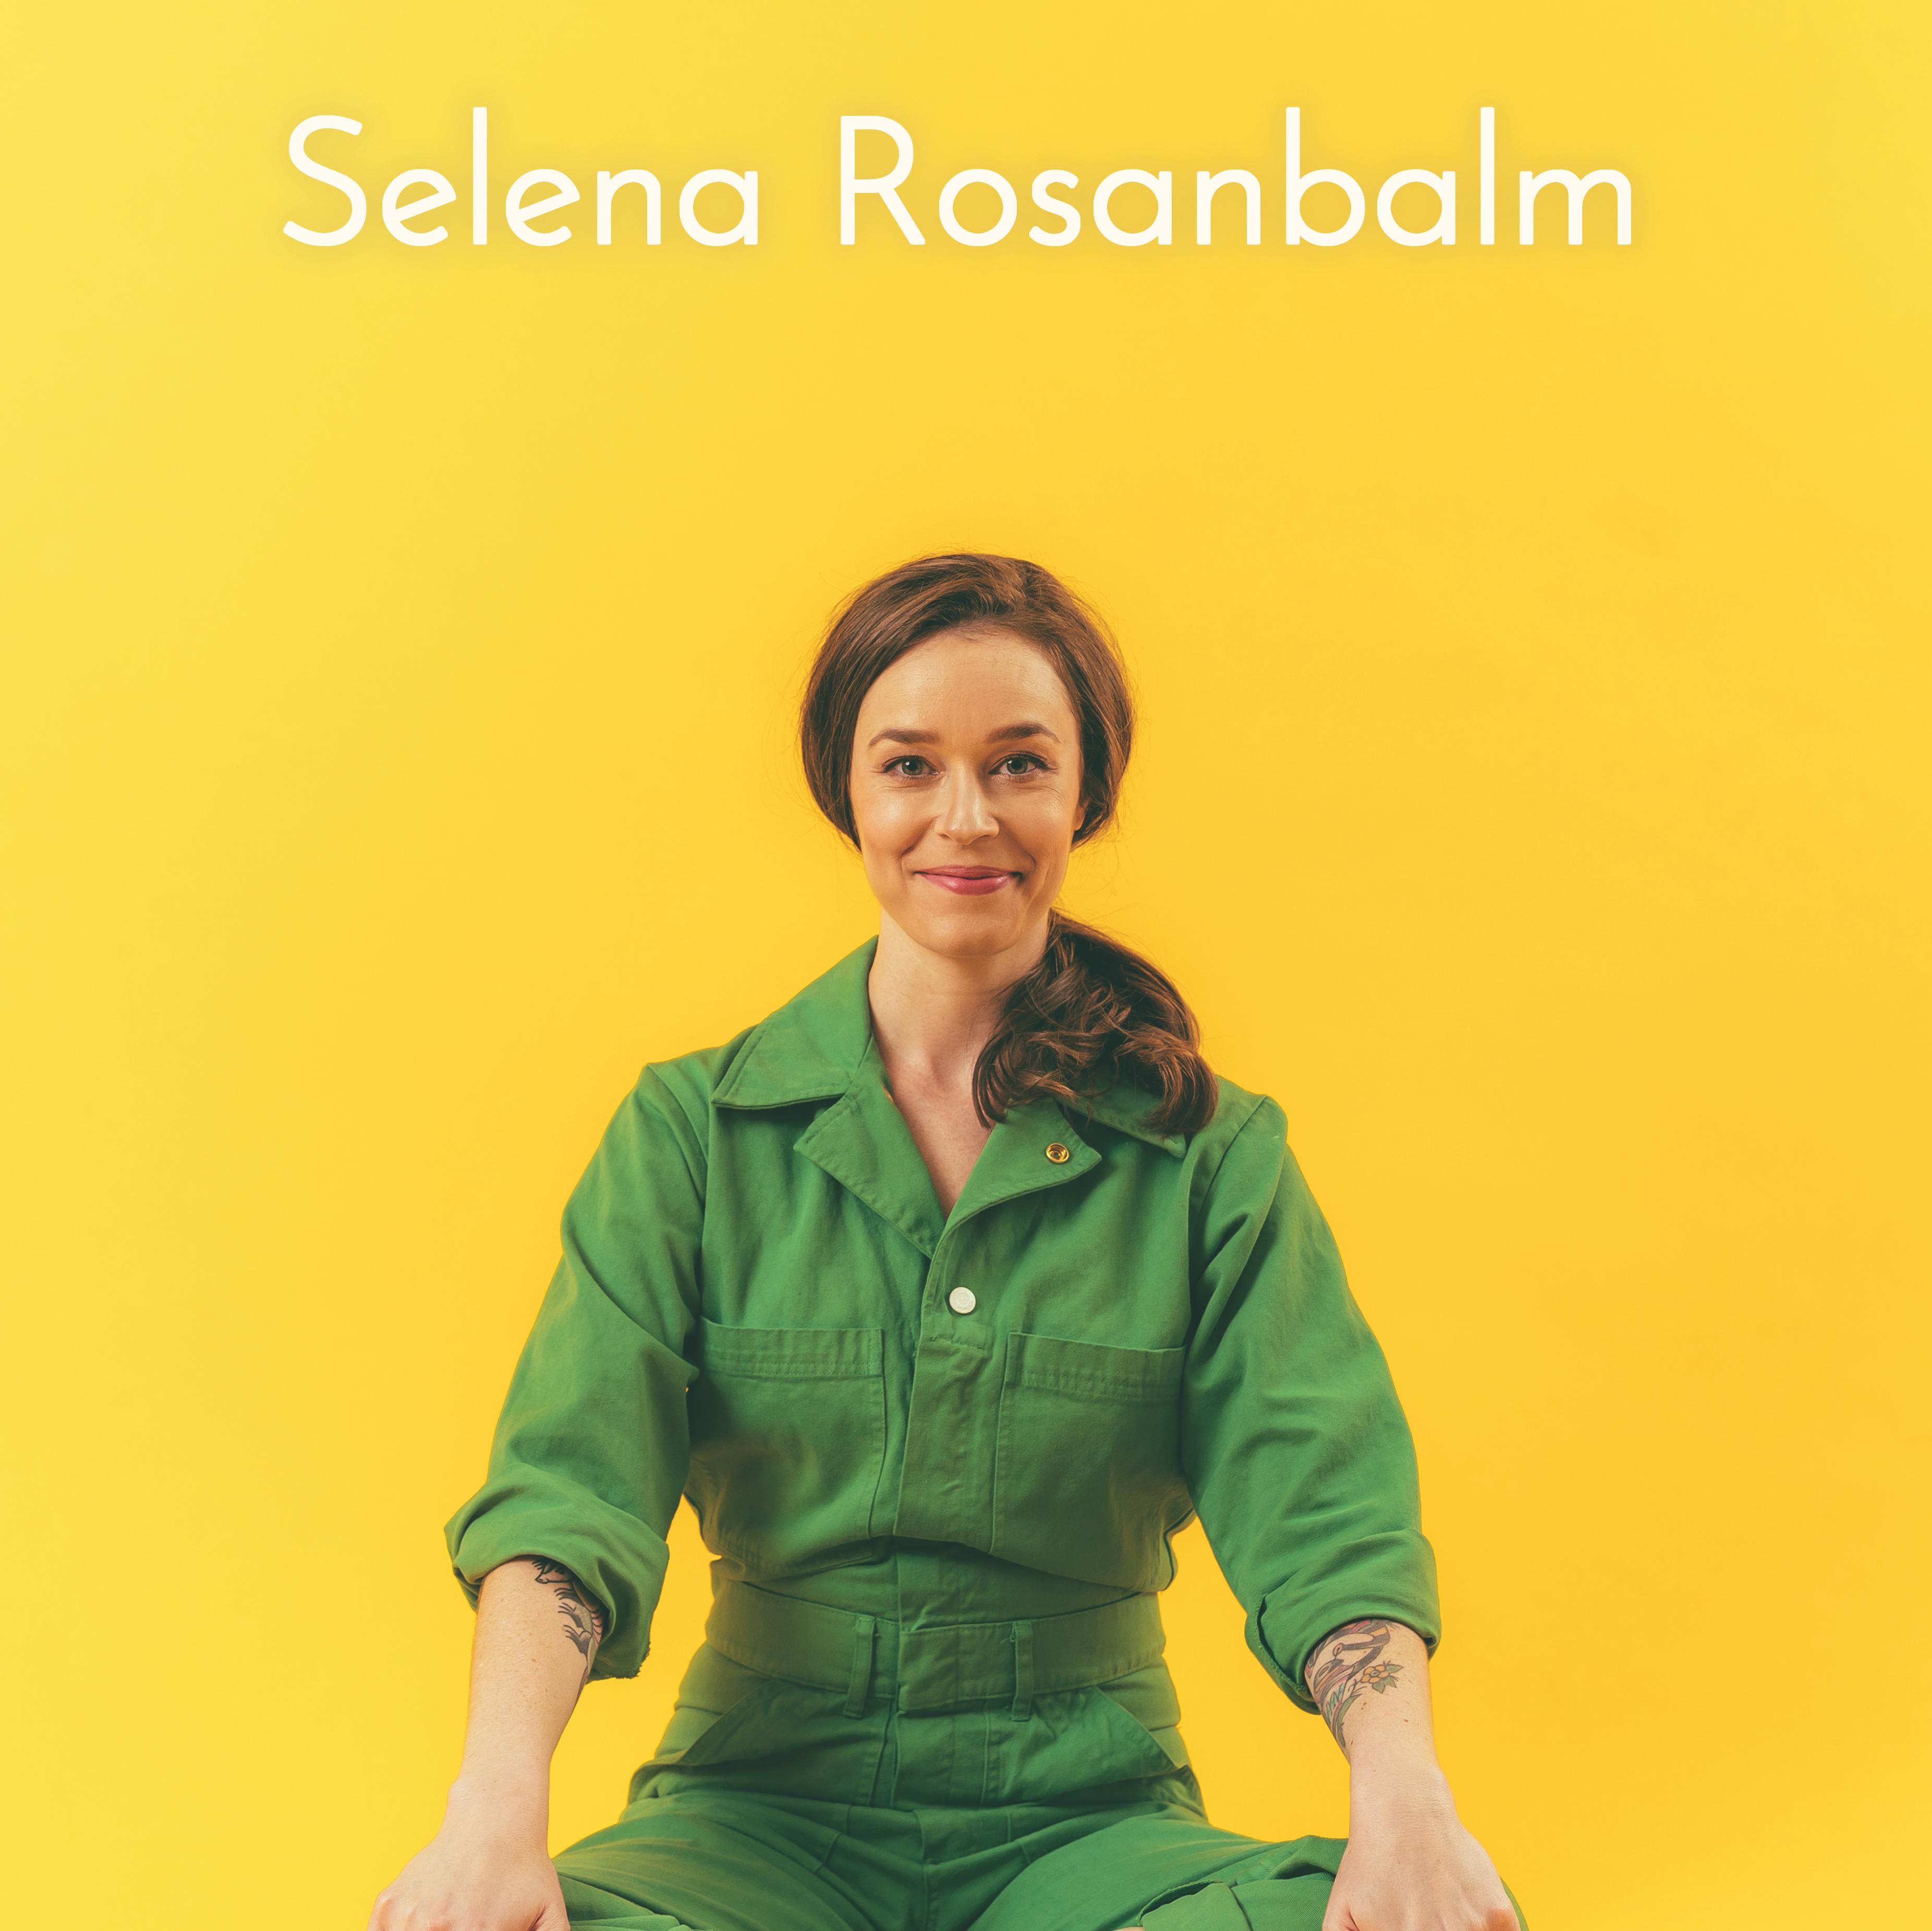 Selena Rosanbalm